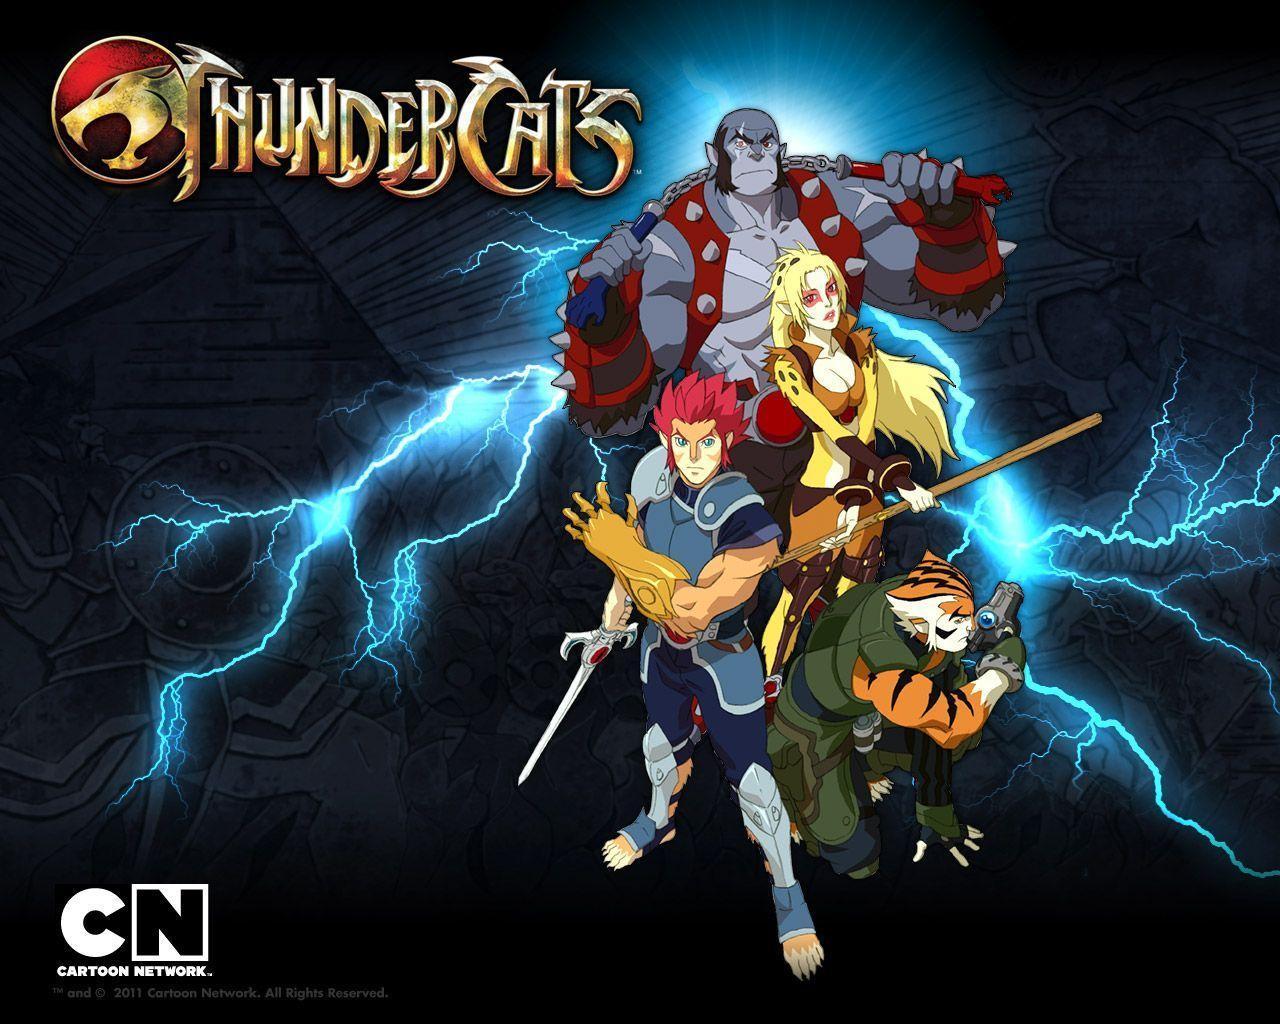 Thundercats Wallpapers Hd Wallpaper Cave